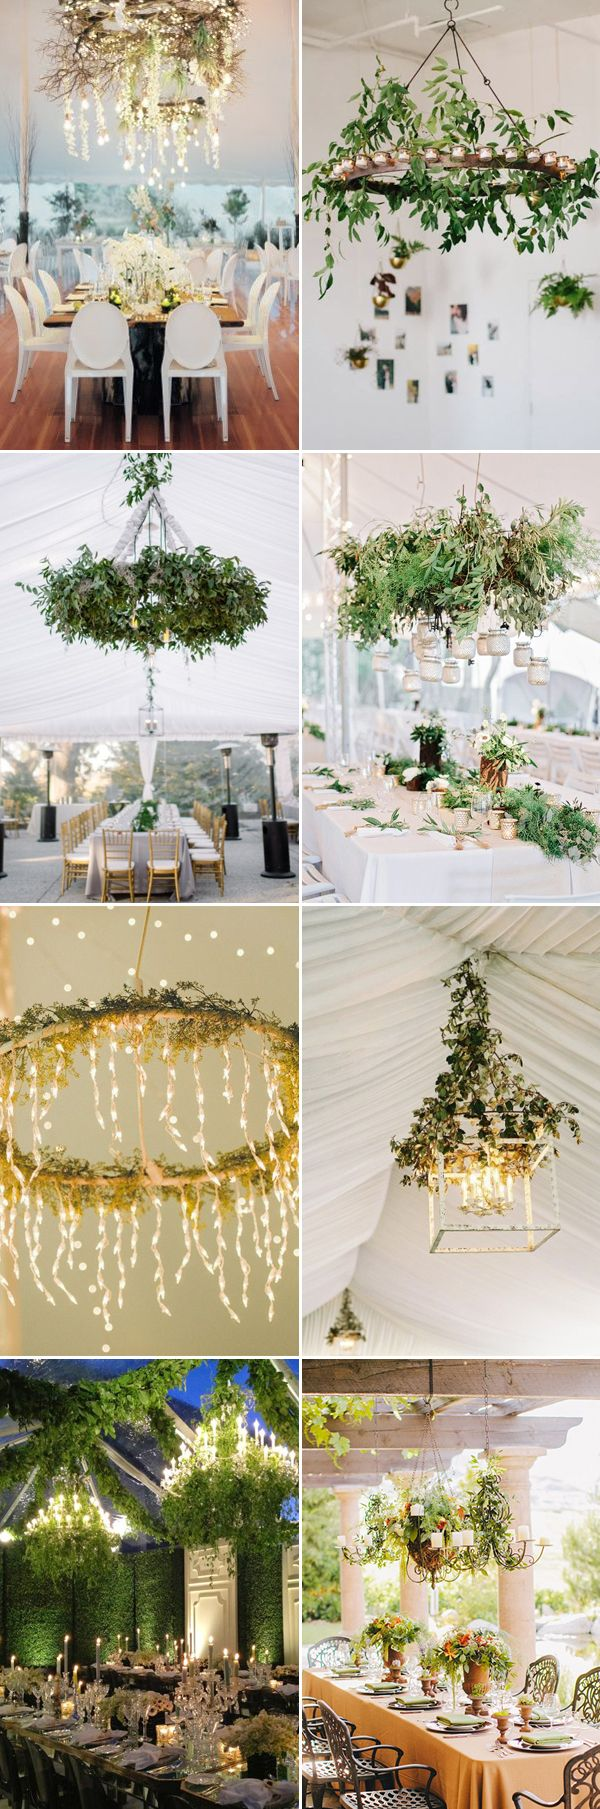 Fairytale Lighting! 25 Romantic Wedding Chandelier Ideas